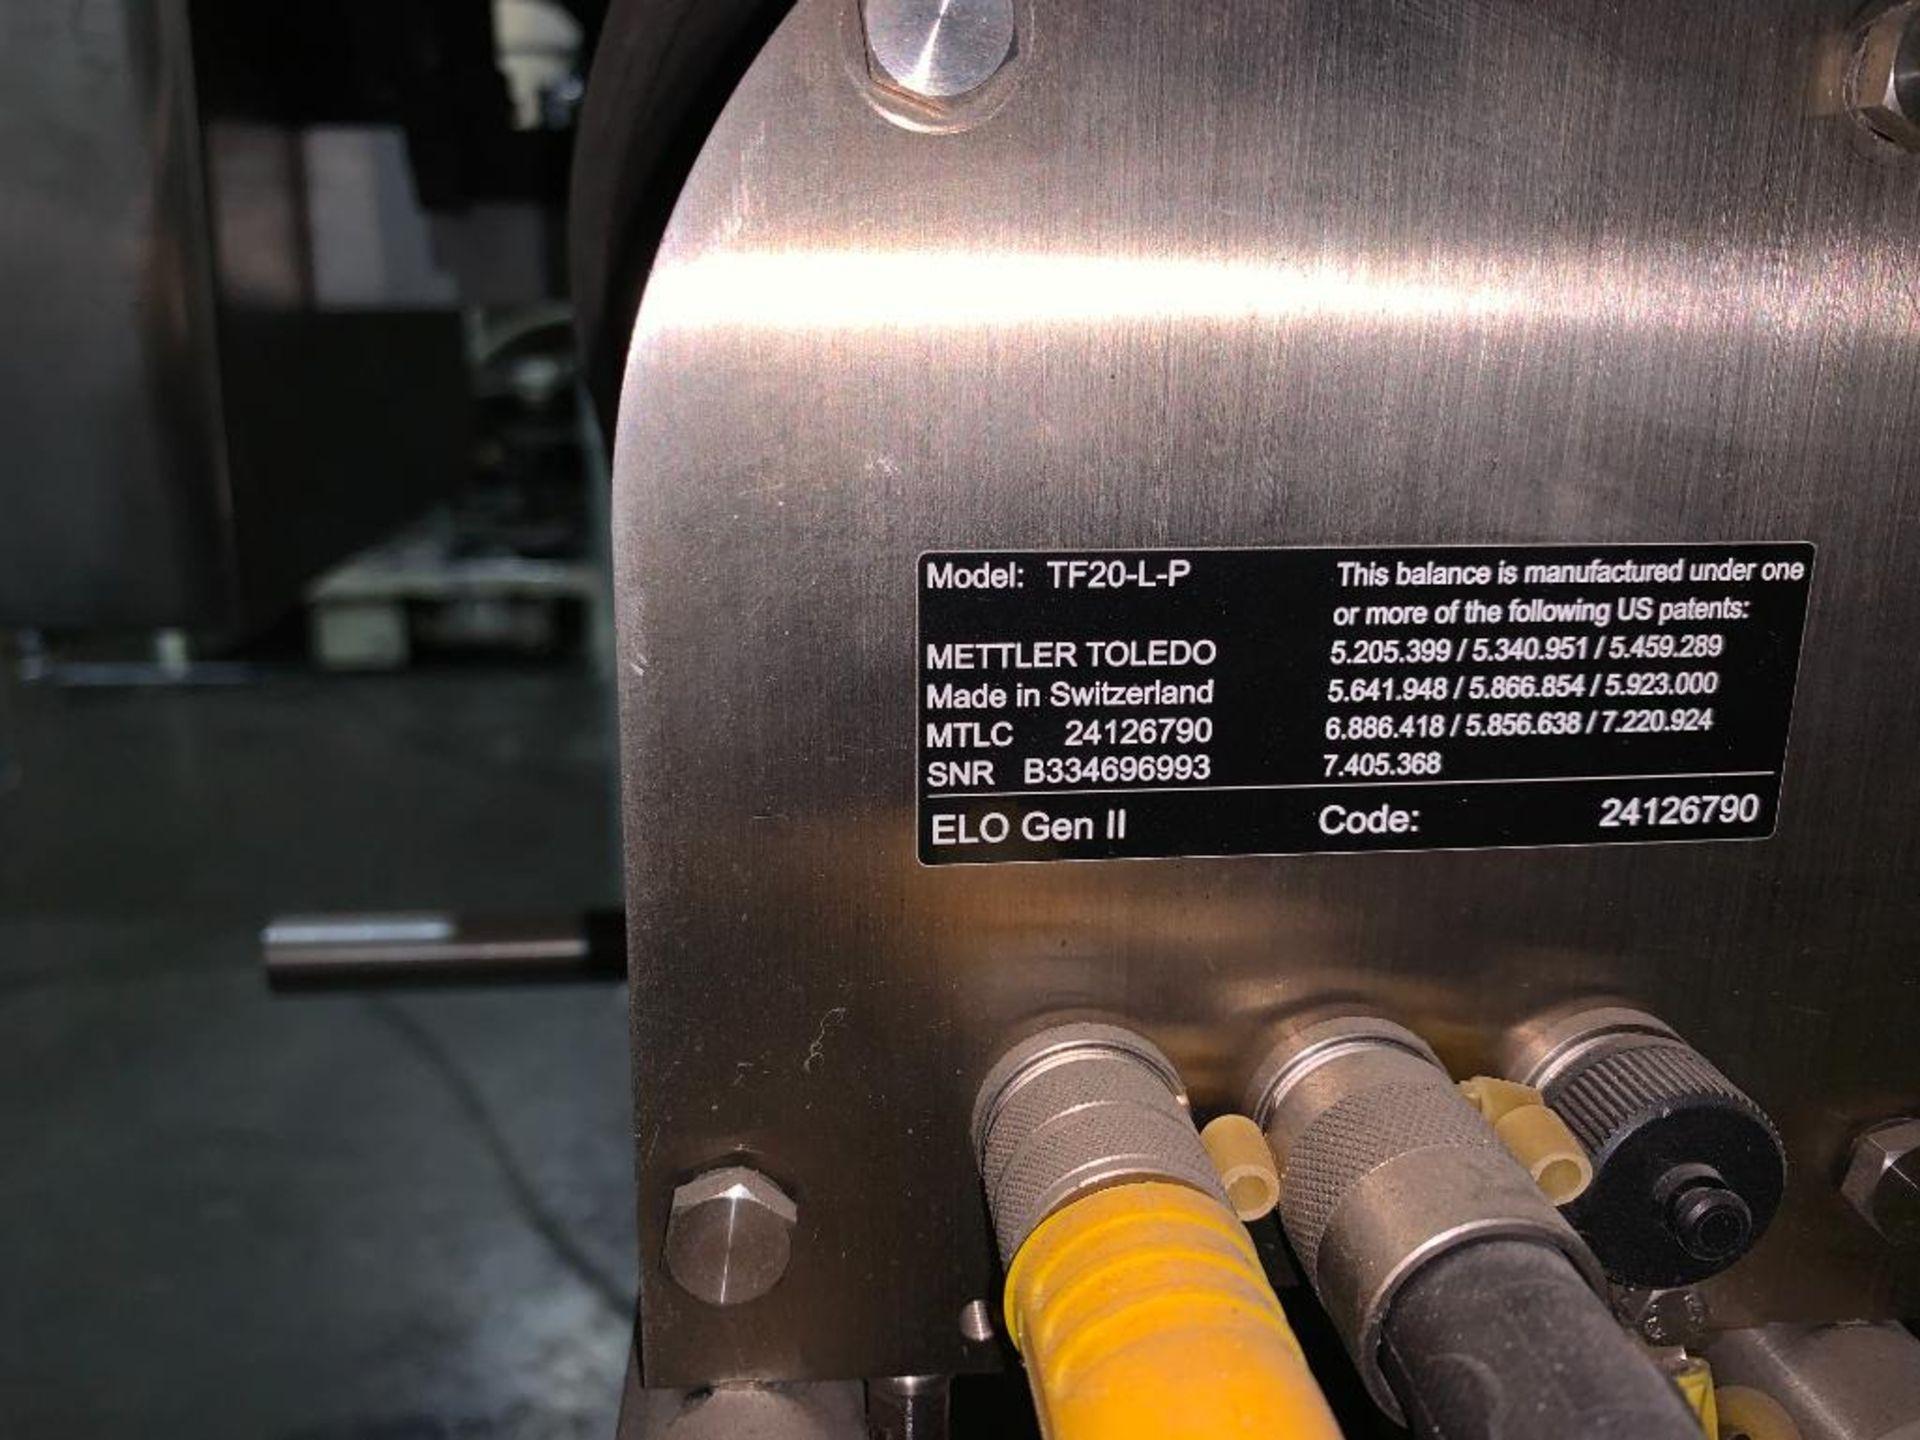 Mettler Toledo CombiChecker combination metal detector and checkweigher, model XE3 - Image 13 of 25